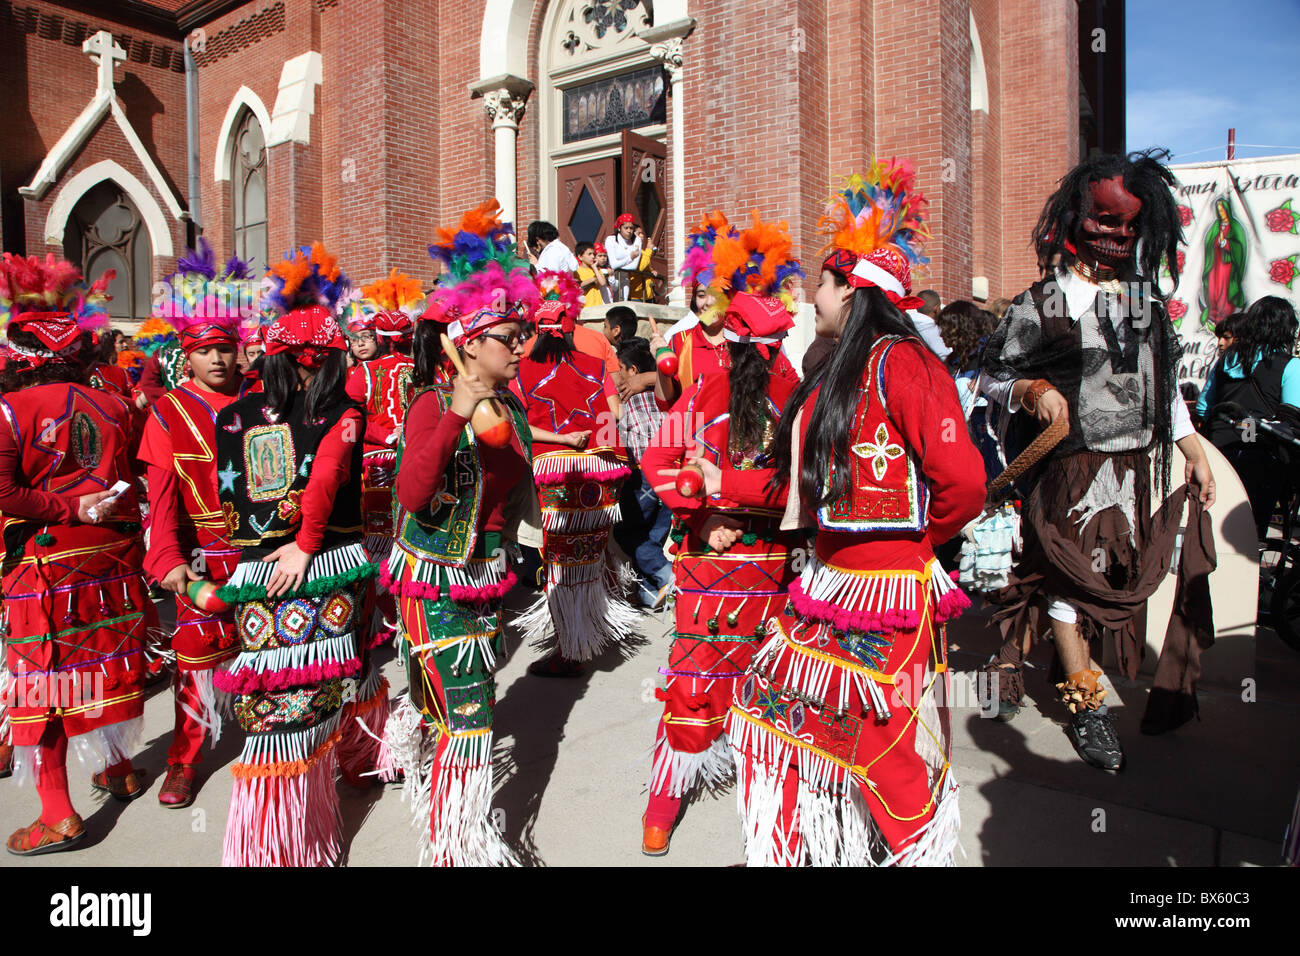 mexican festival celebrating the virgin mary catholic church